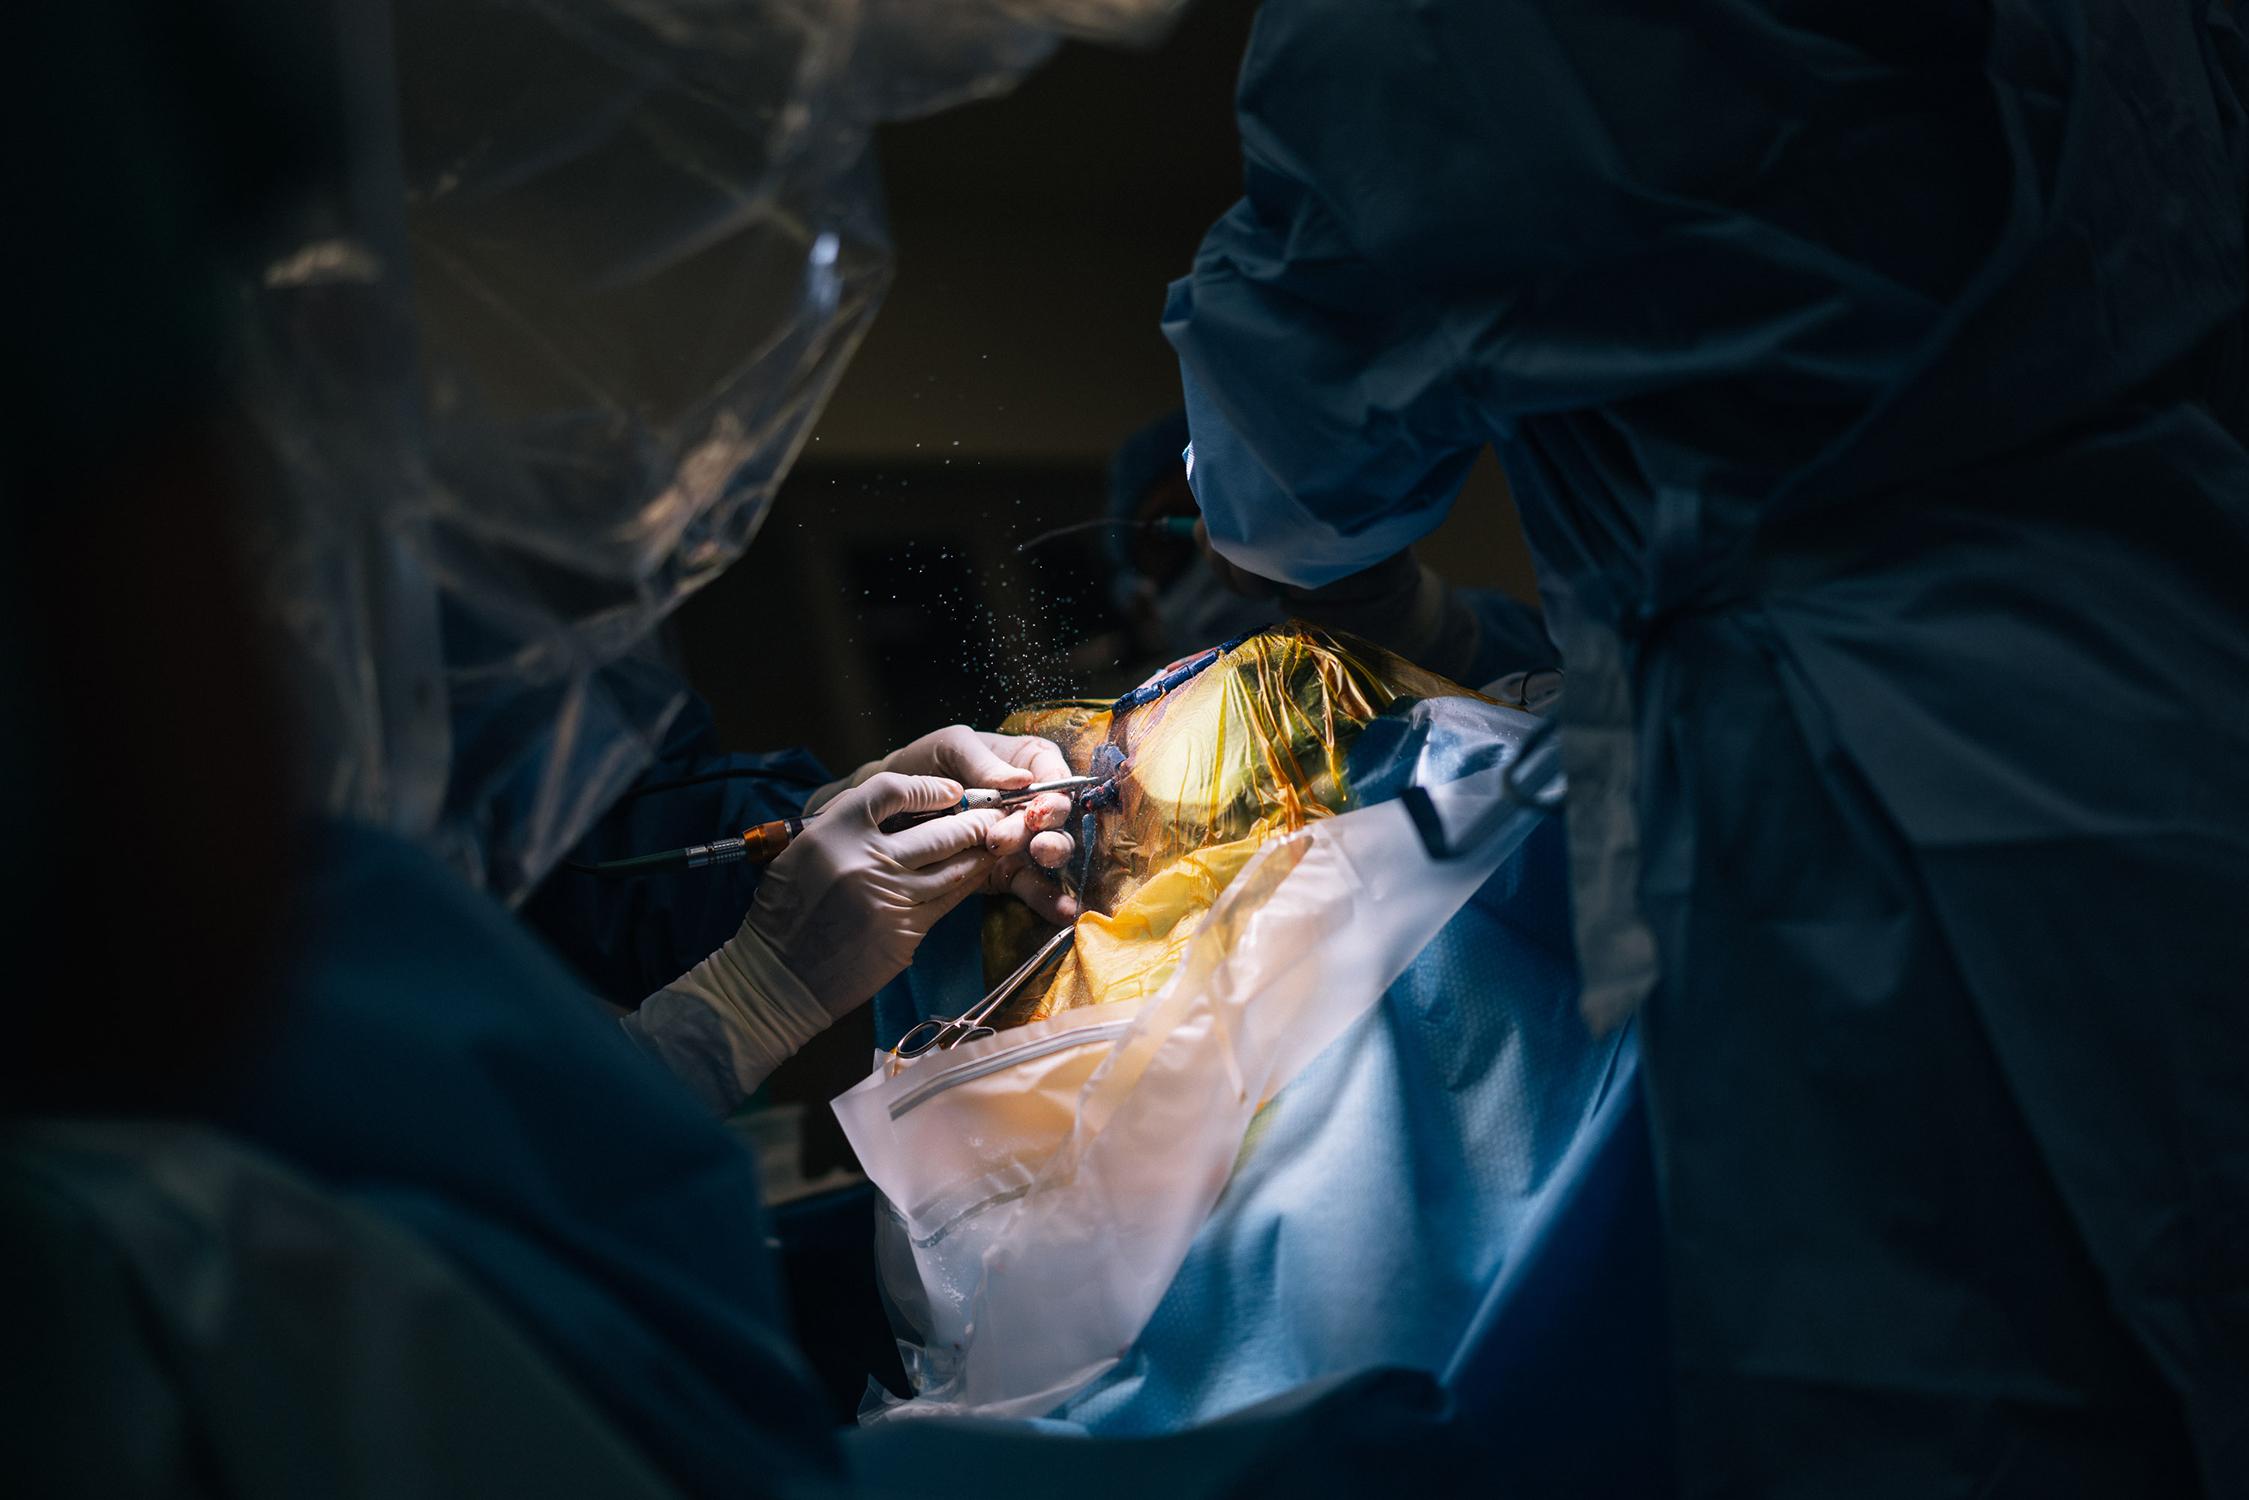 the brain surgery begins